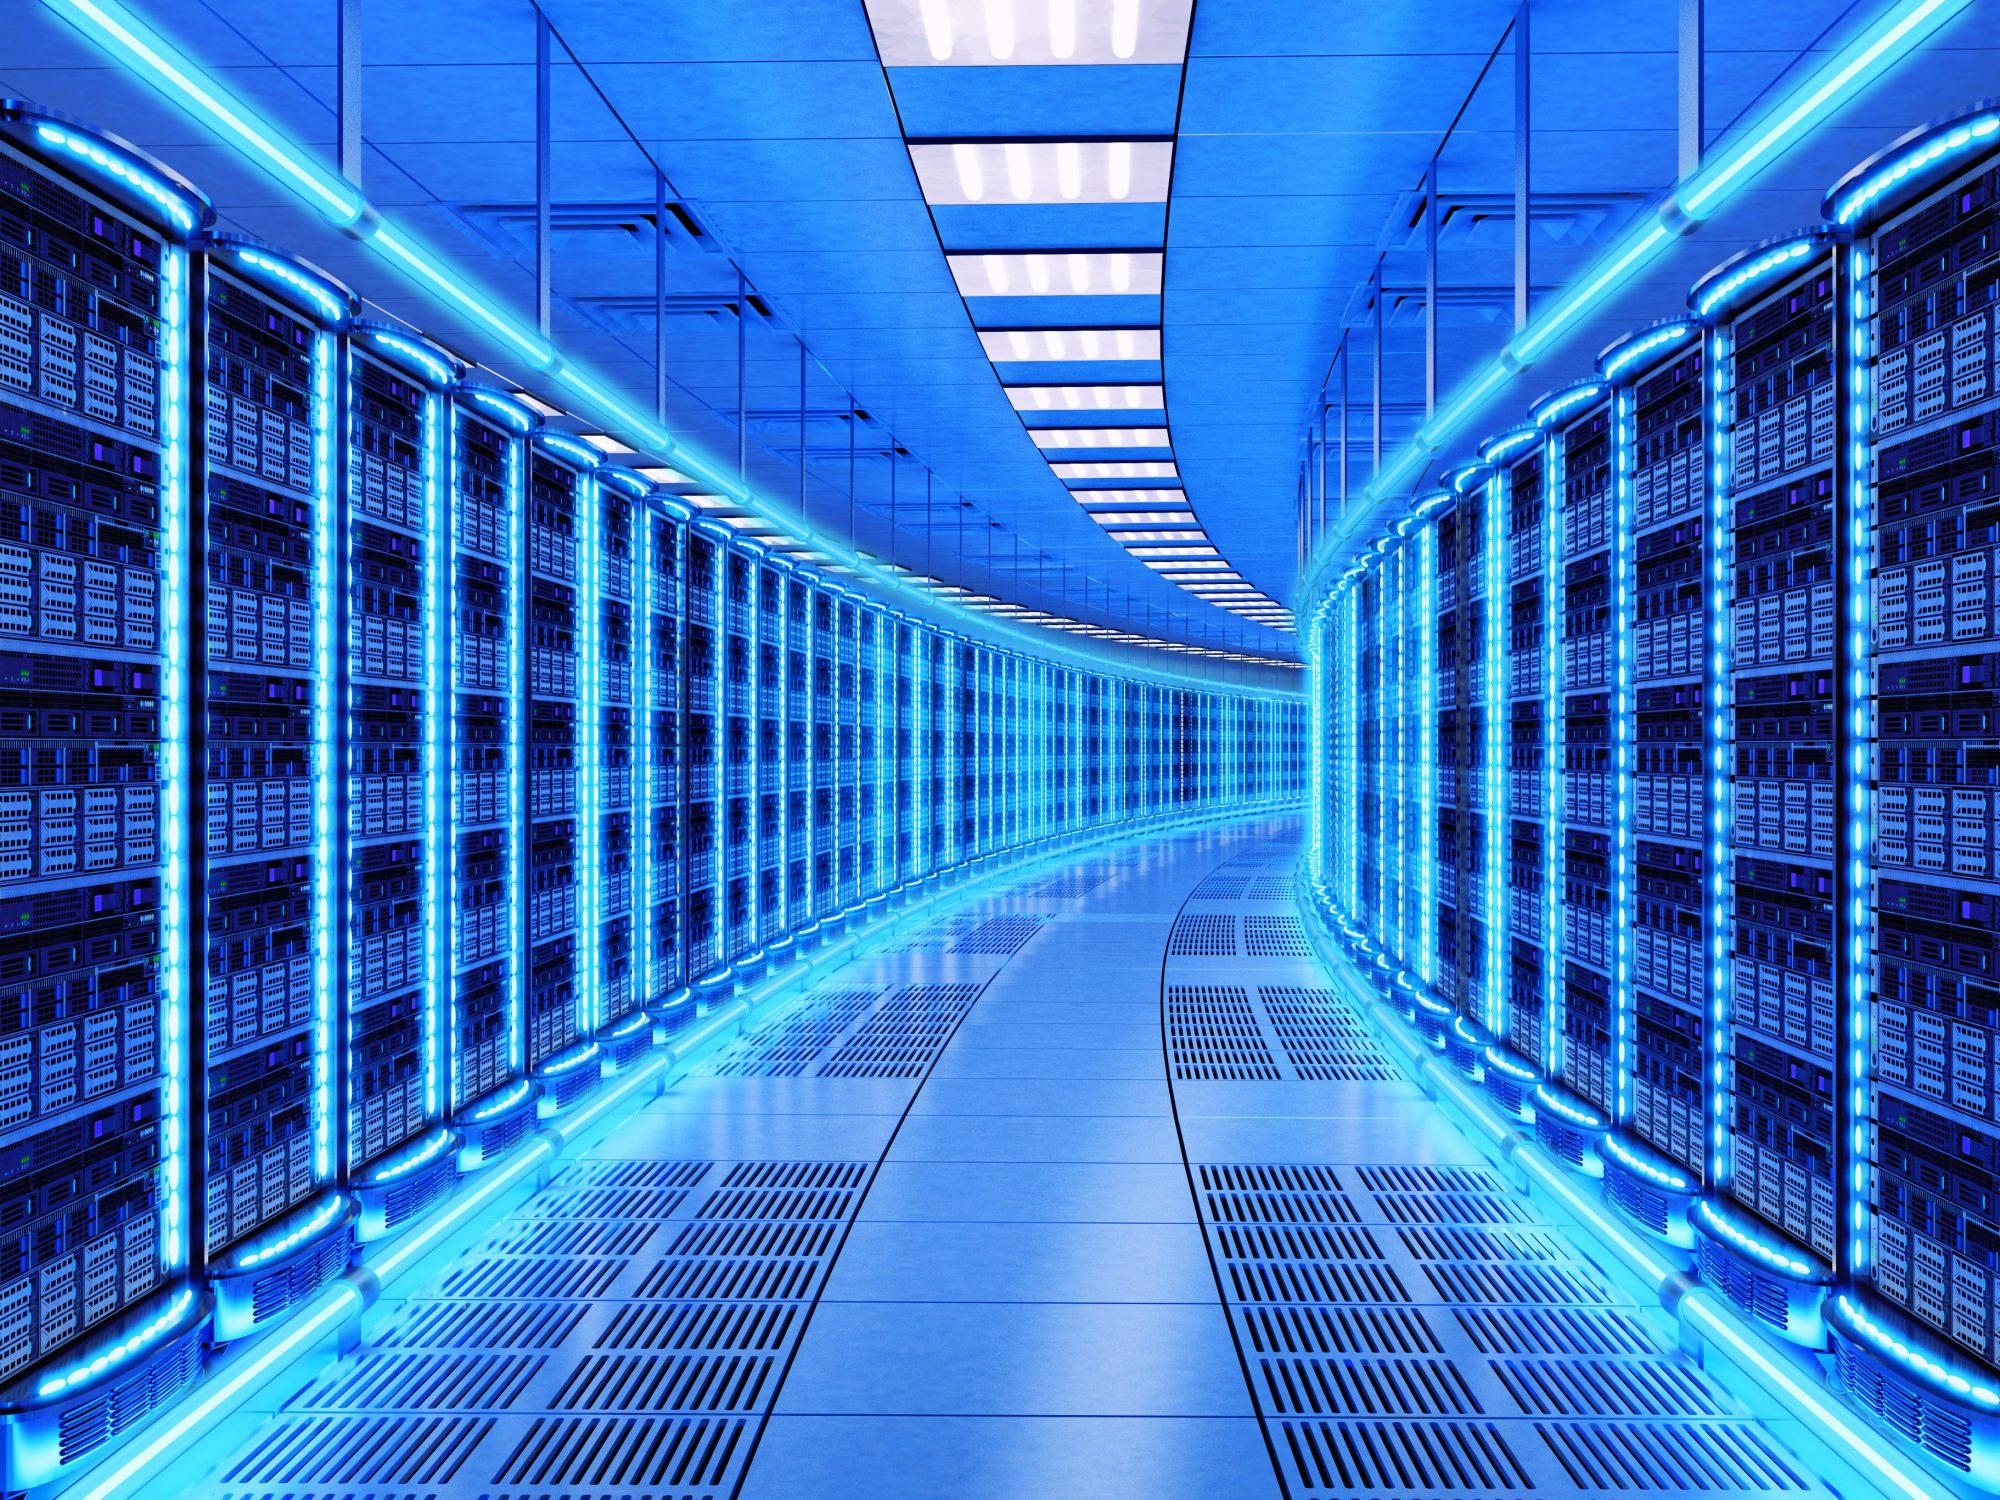 General 2000x1500 digital blue hallway technology server neon glowing network datacenter data center